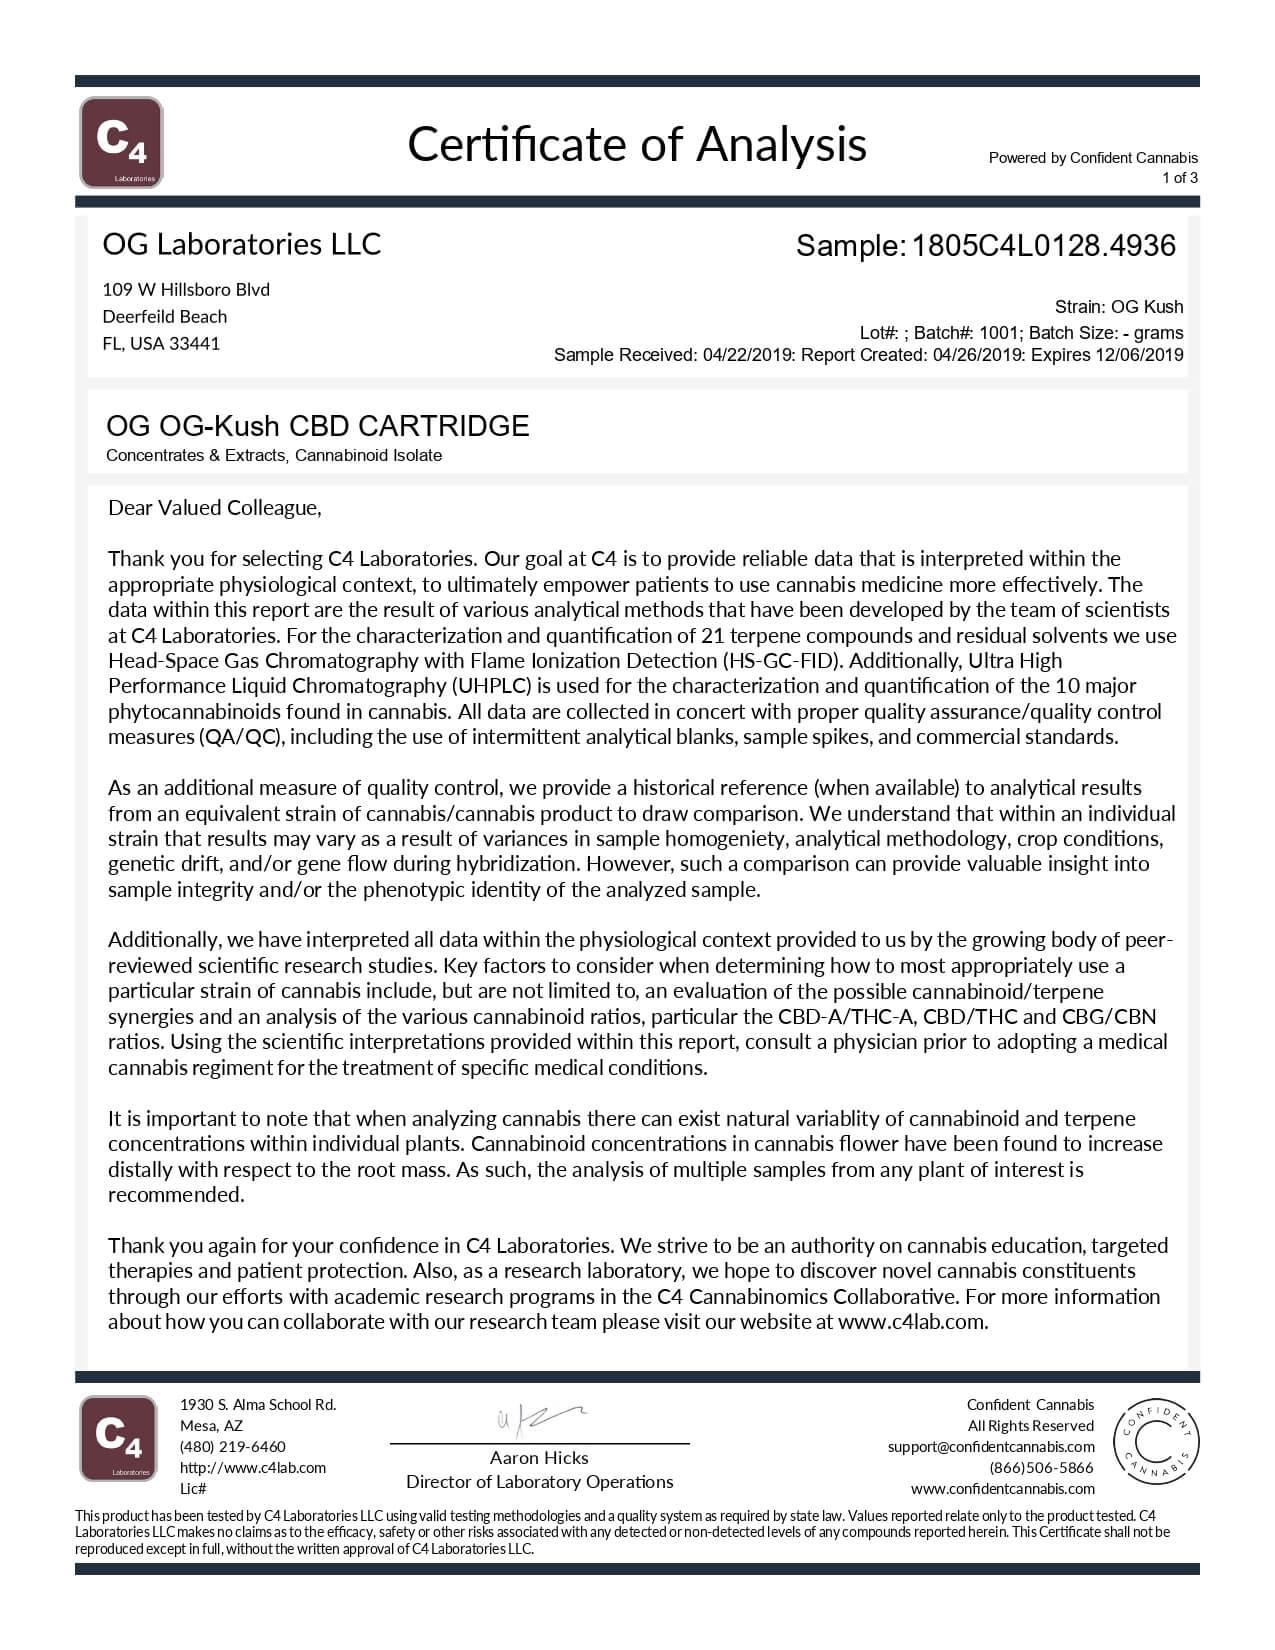 OG Labs CBD Cartridge Kush Lab Report